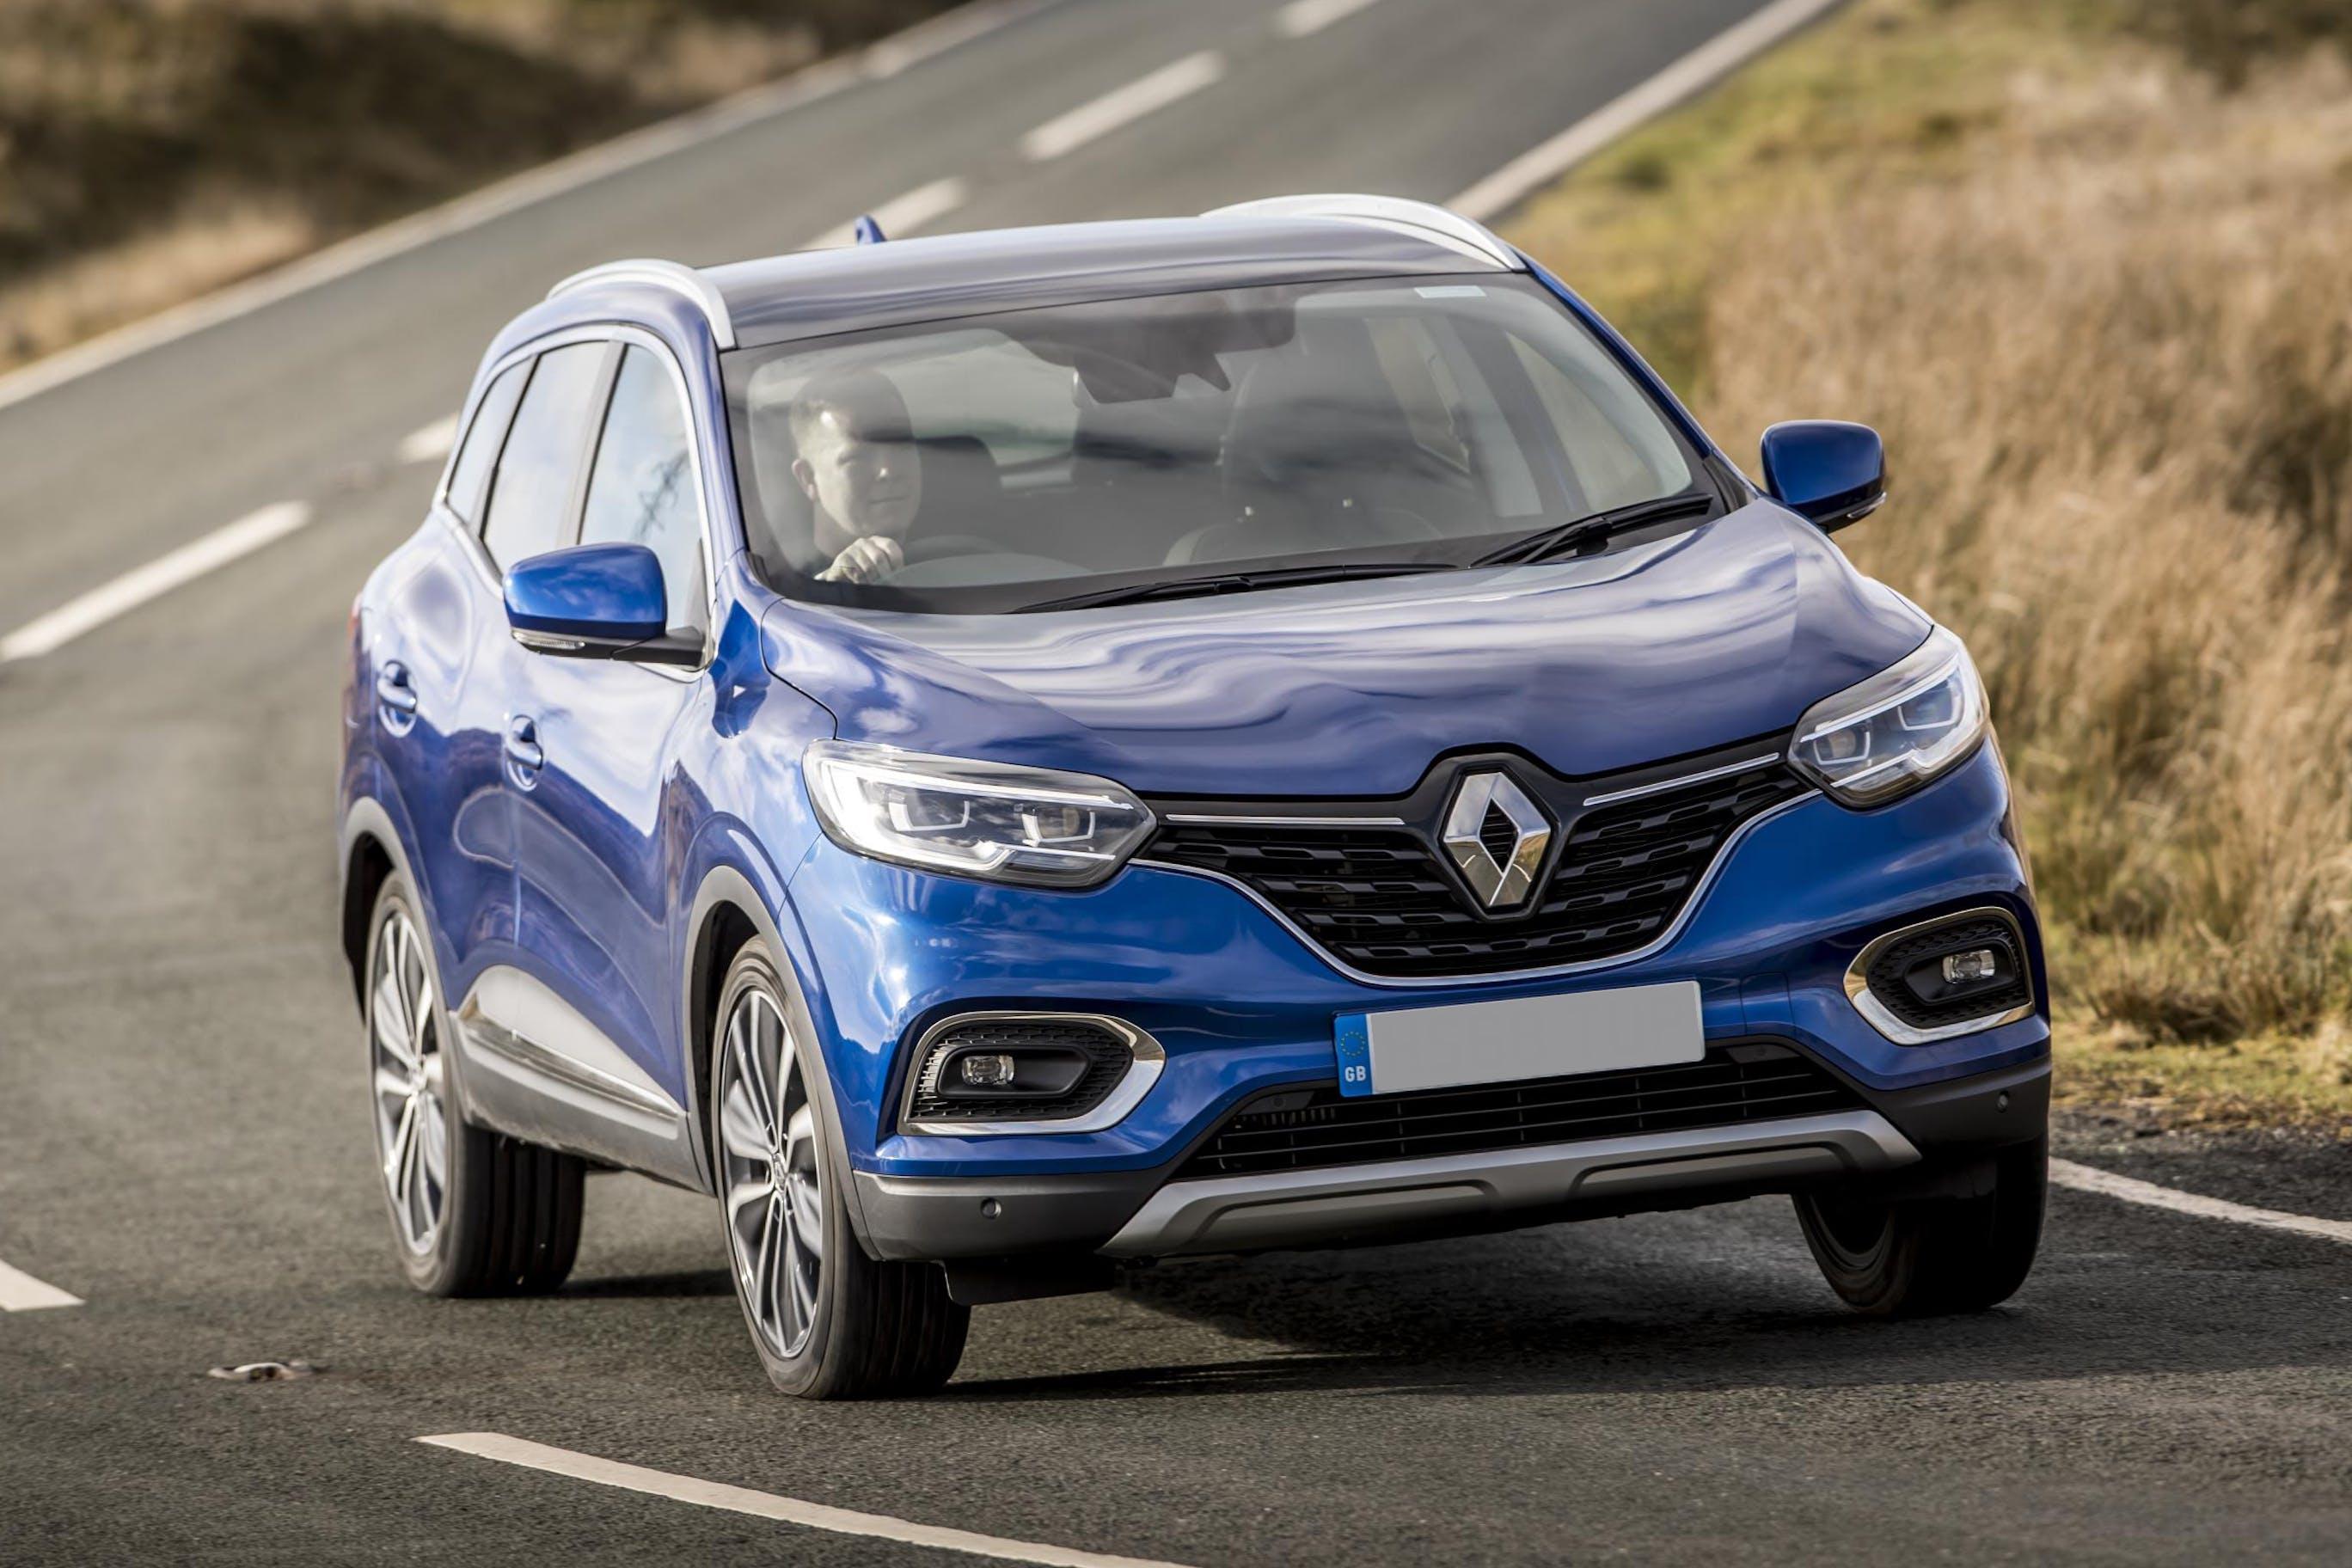 The exteriof of a blue Renault Kadjar